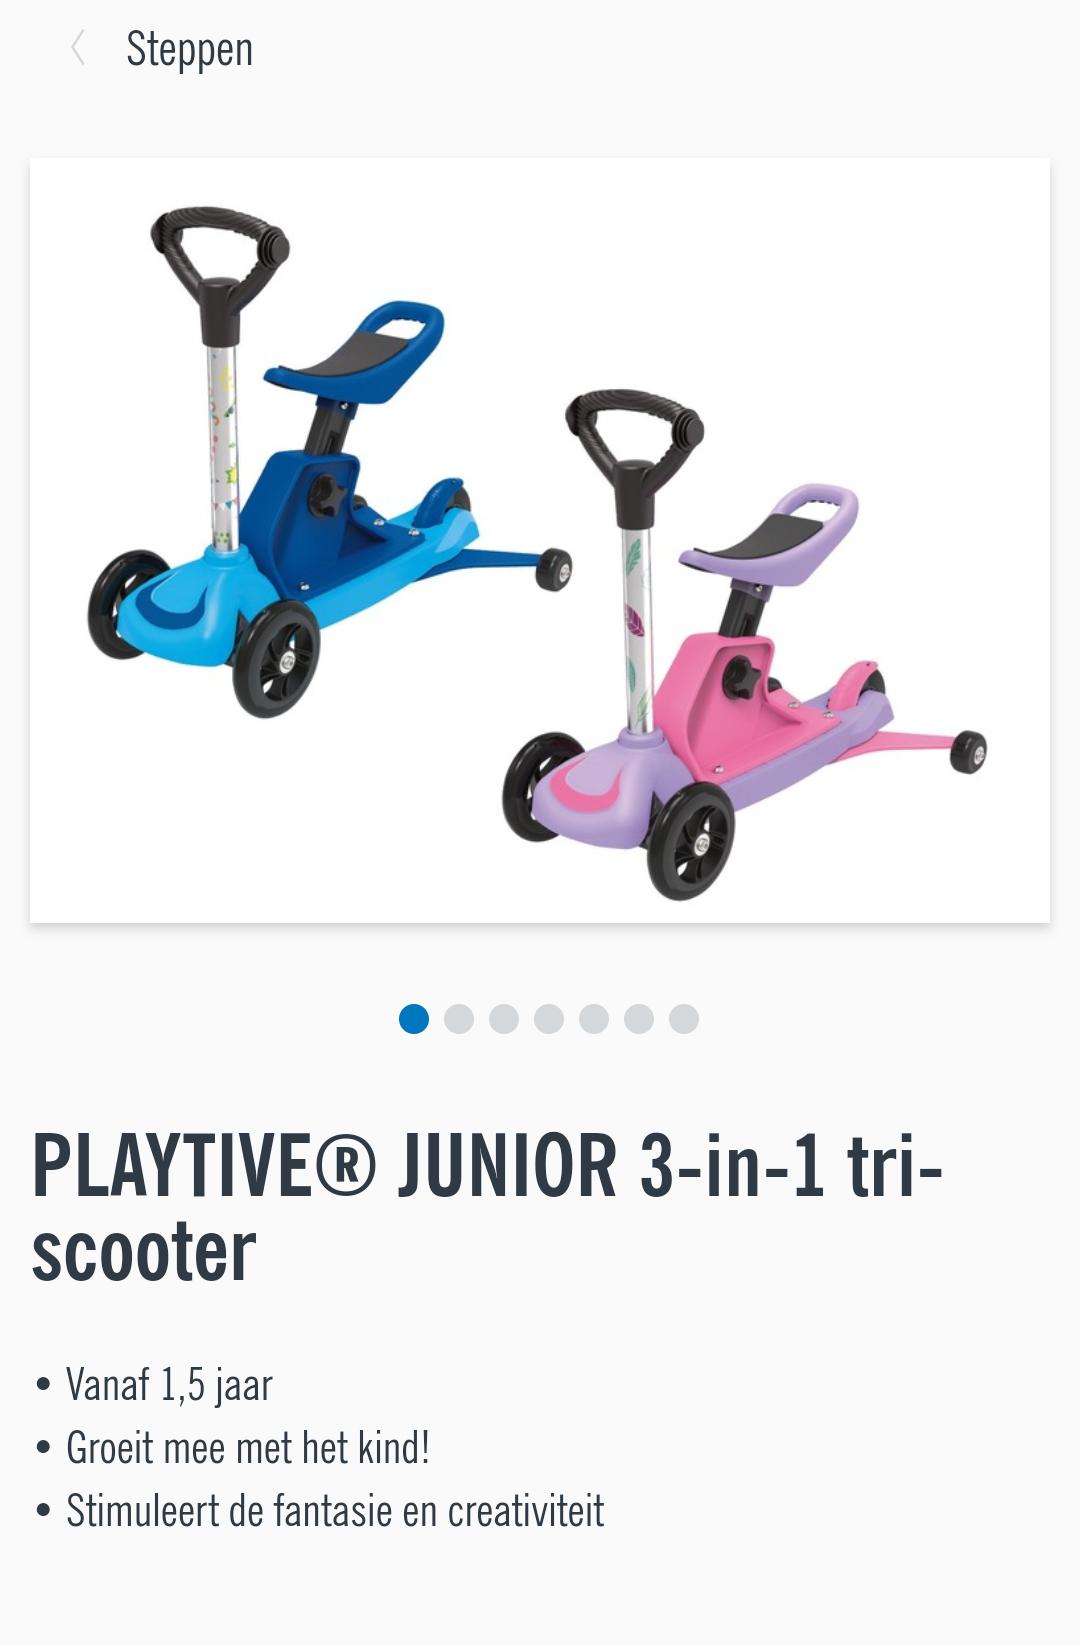 3in1 tri scooter! Lidl aanbieding